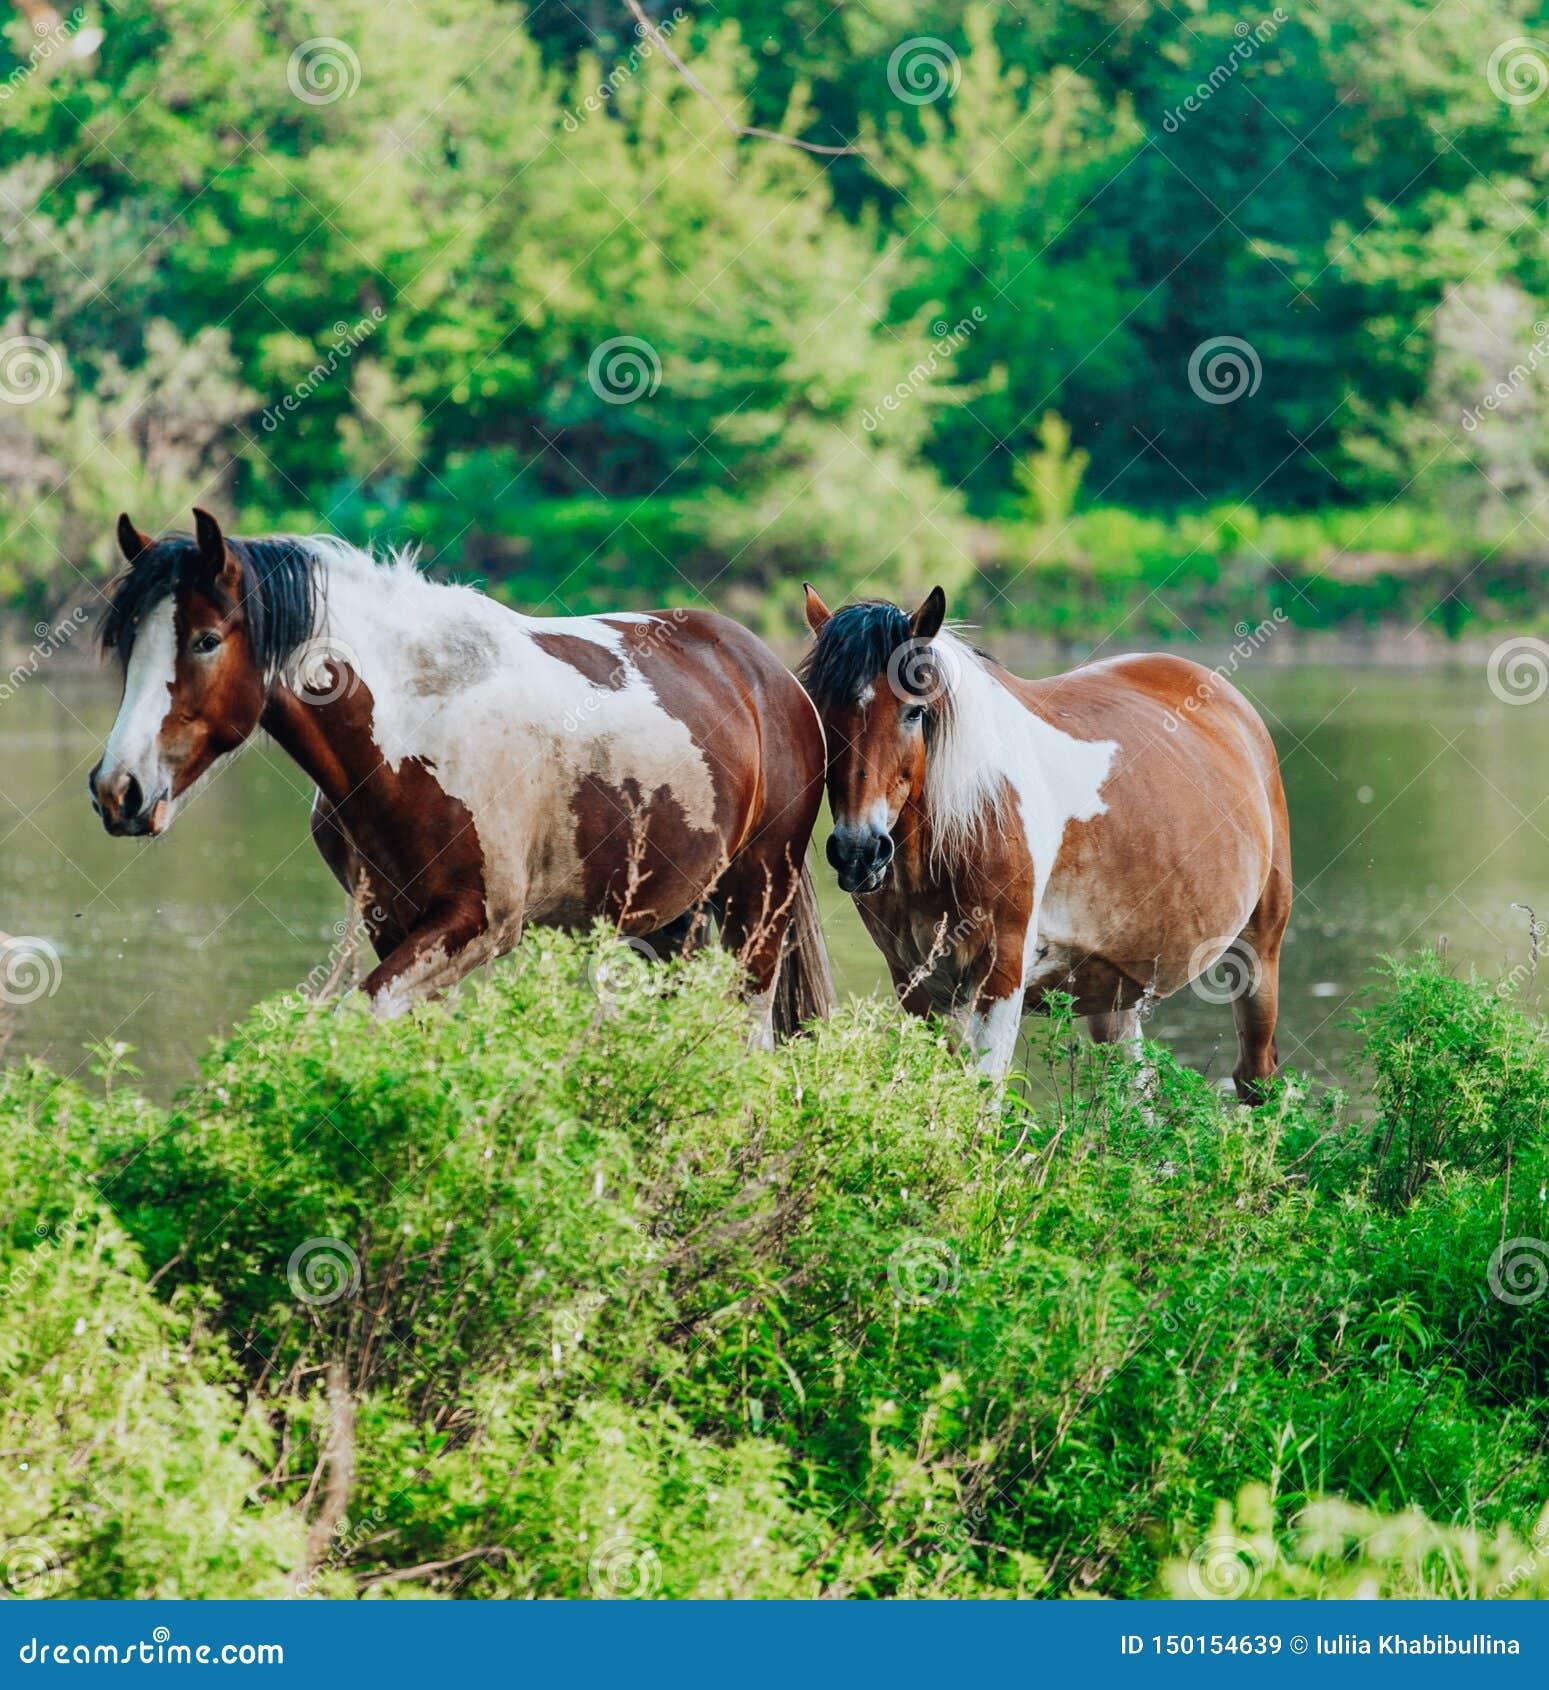 El caballo vino al r?o beber el agua